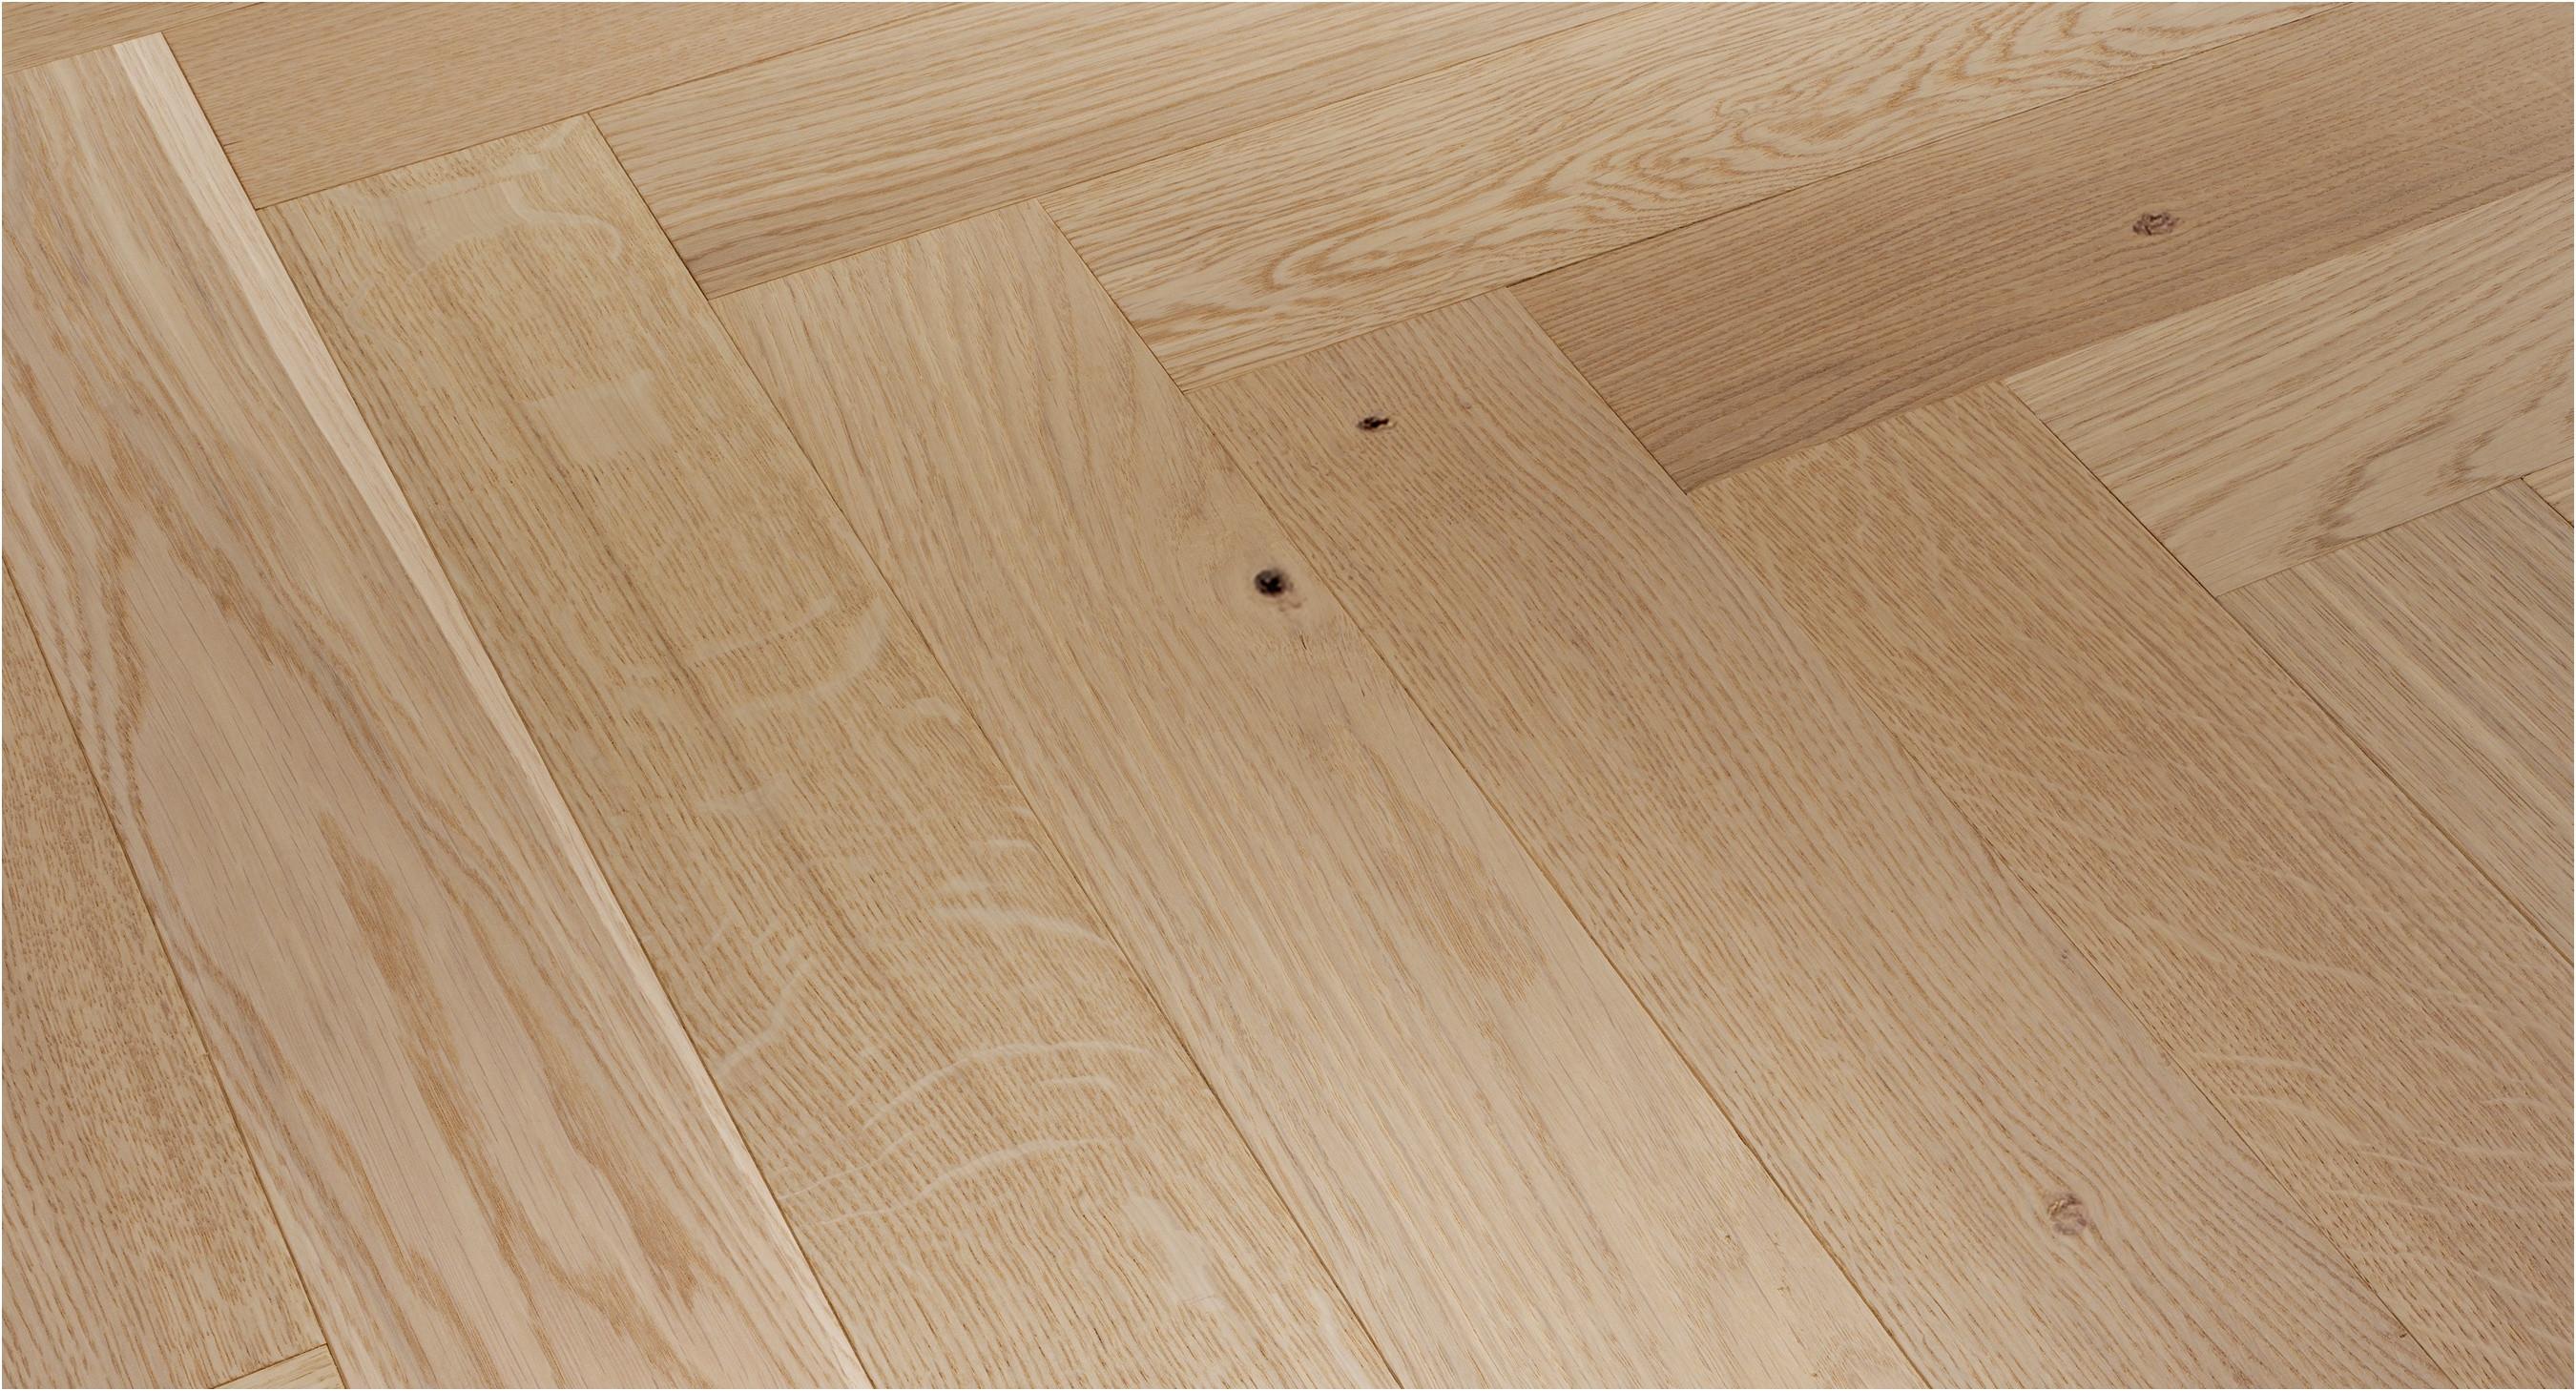 how to cut hardwood floor transition of flooring near me flooring sale near me stock 0d grace place barnegat throughout flooring near me flooring sale near me stock 0d grace place barnegat nj